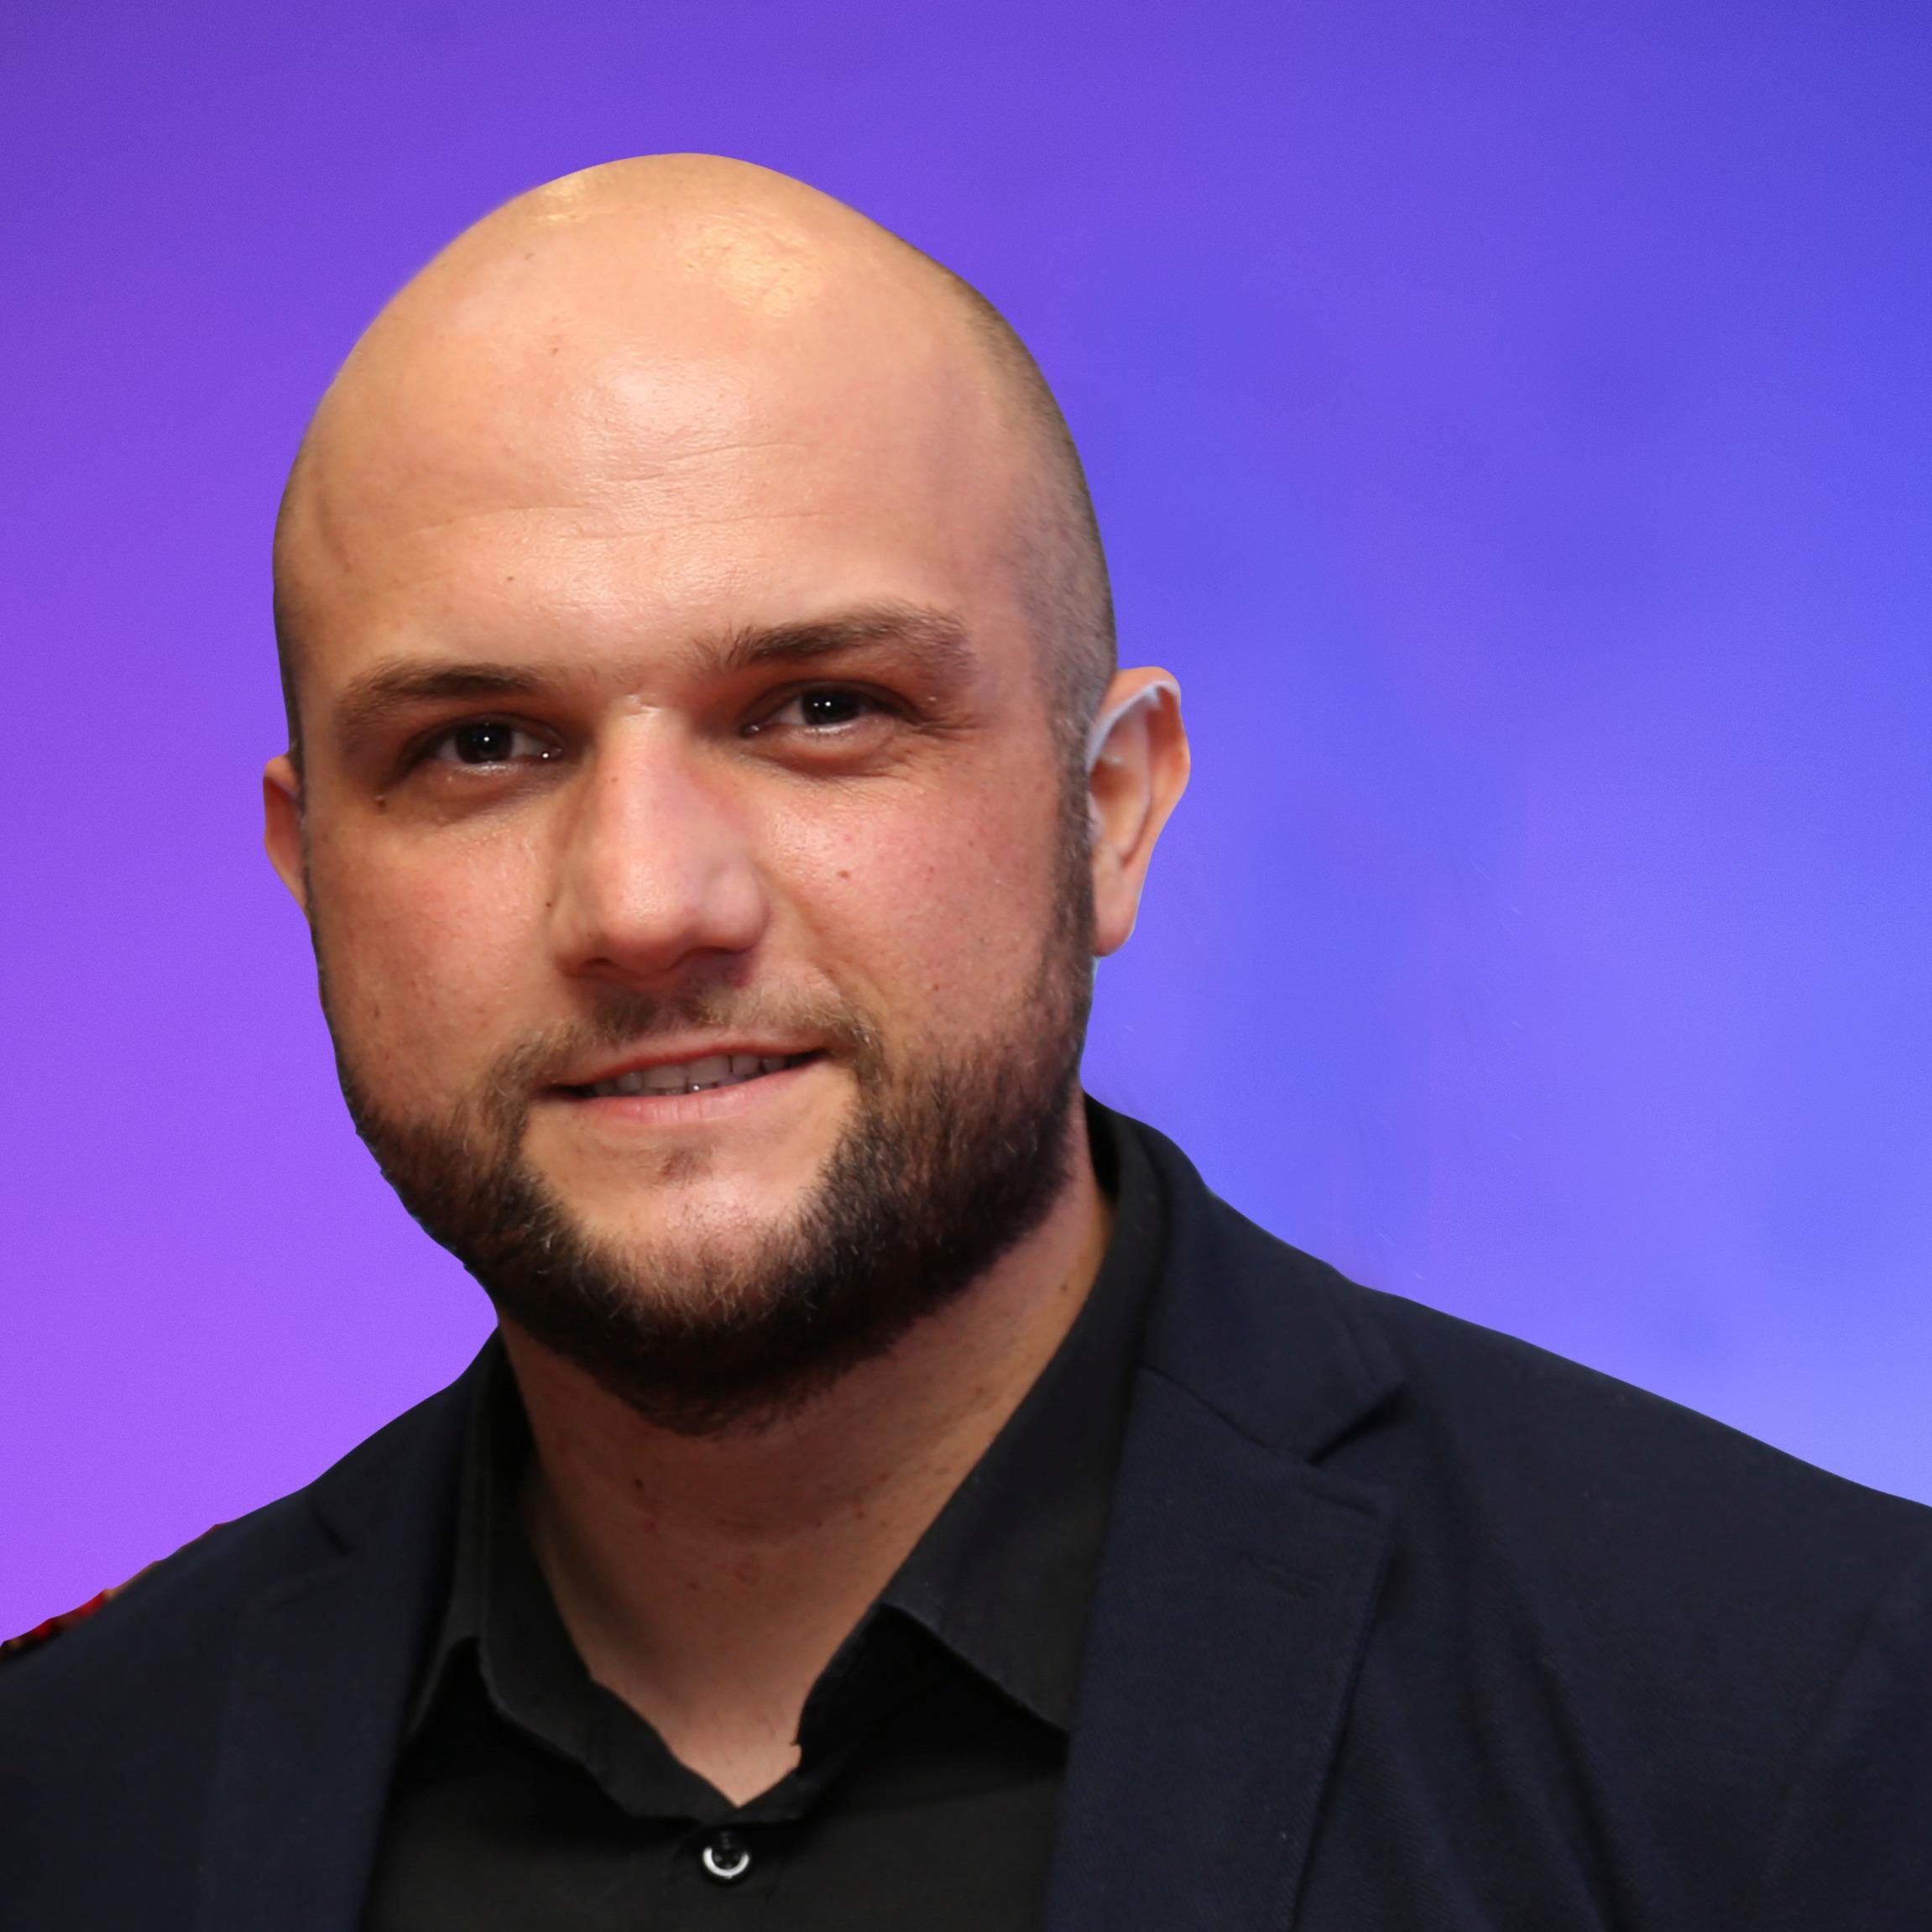 Admir Velić